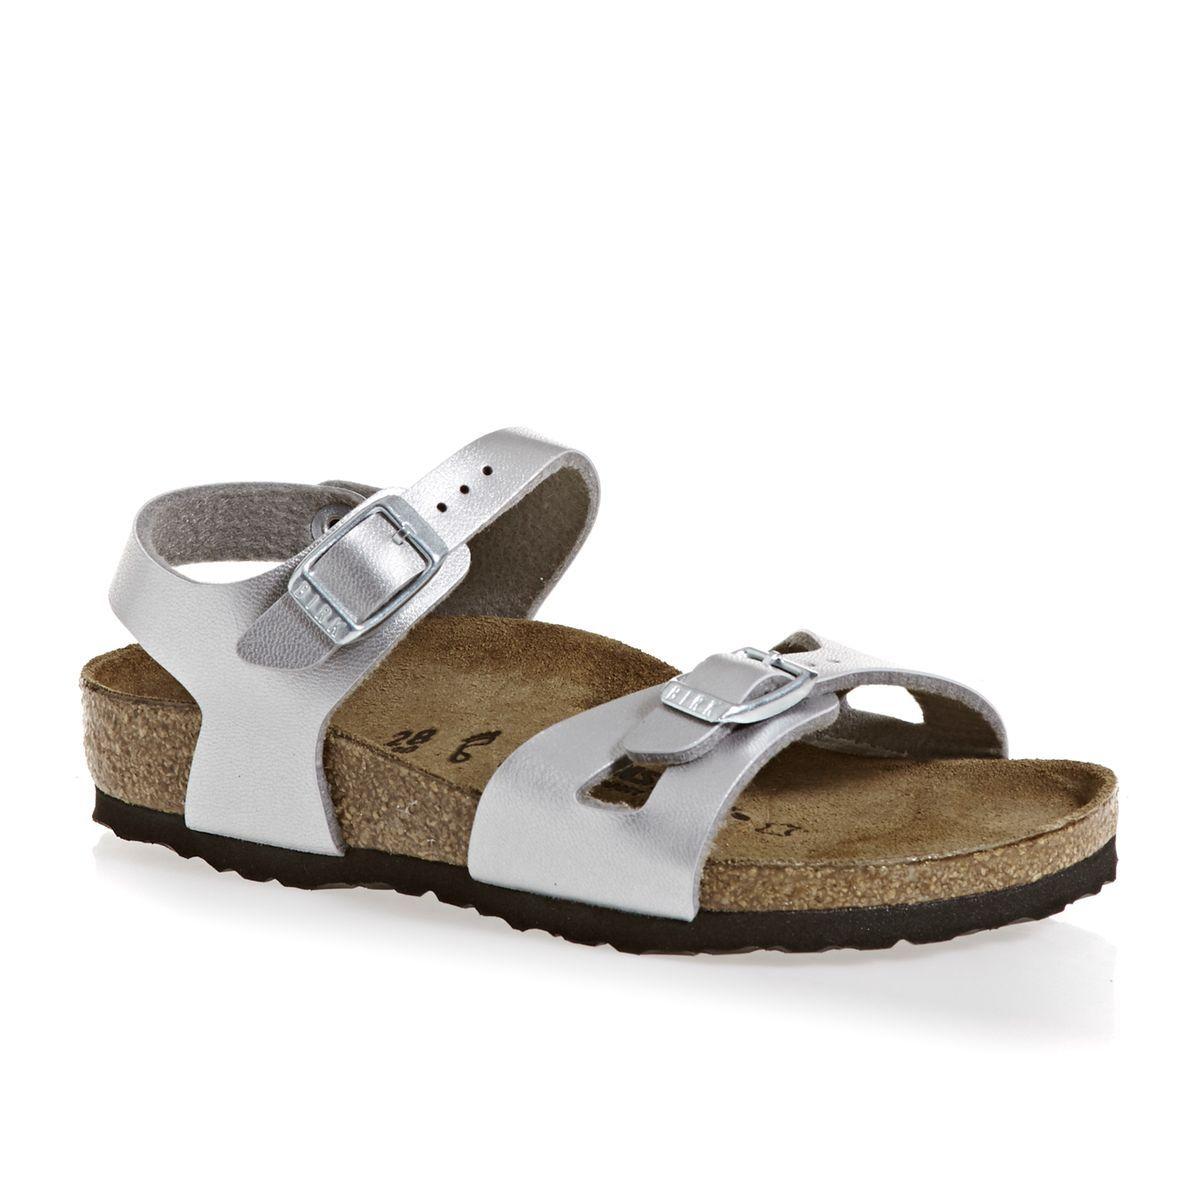 Birkenstock Rio Kids Birkoflor Regular Girls Sandals   Shoes